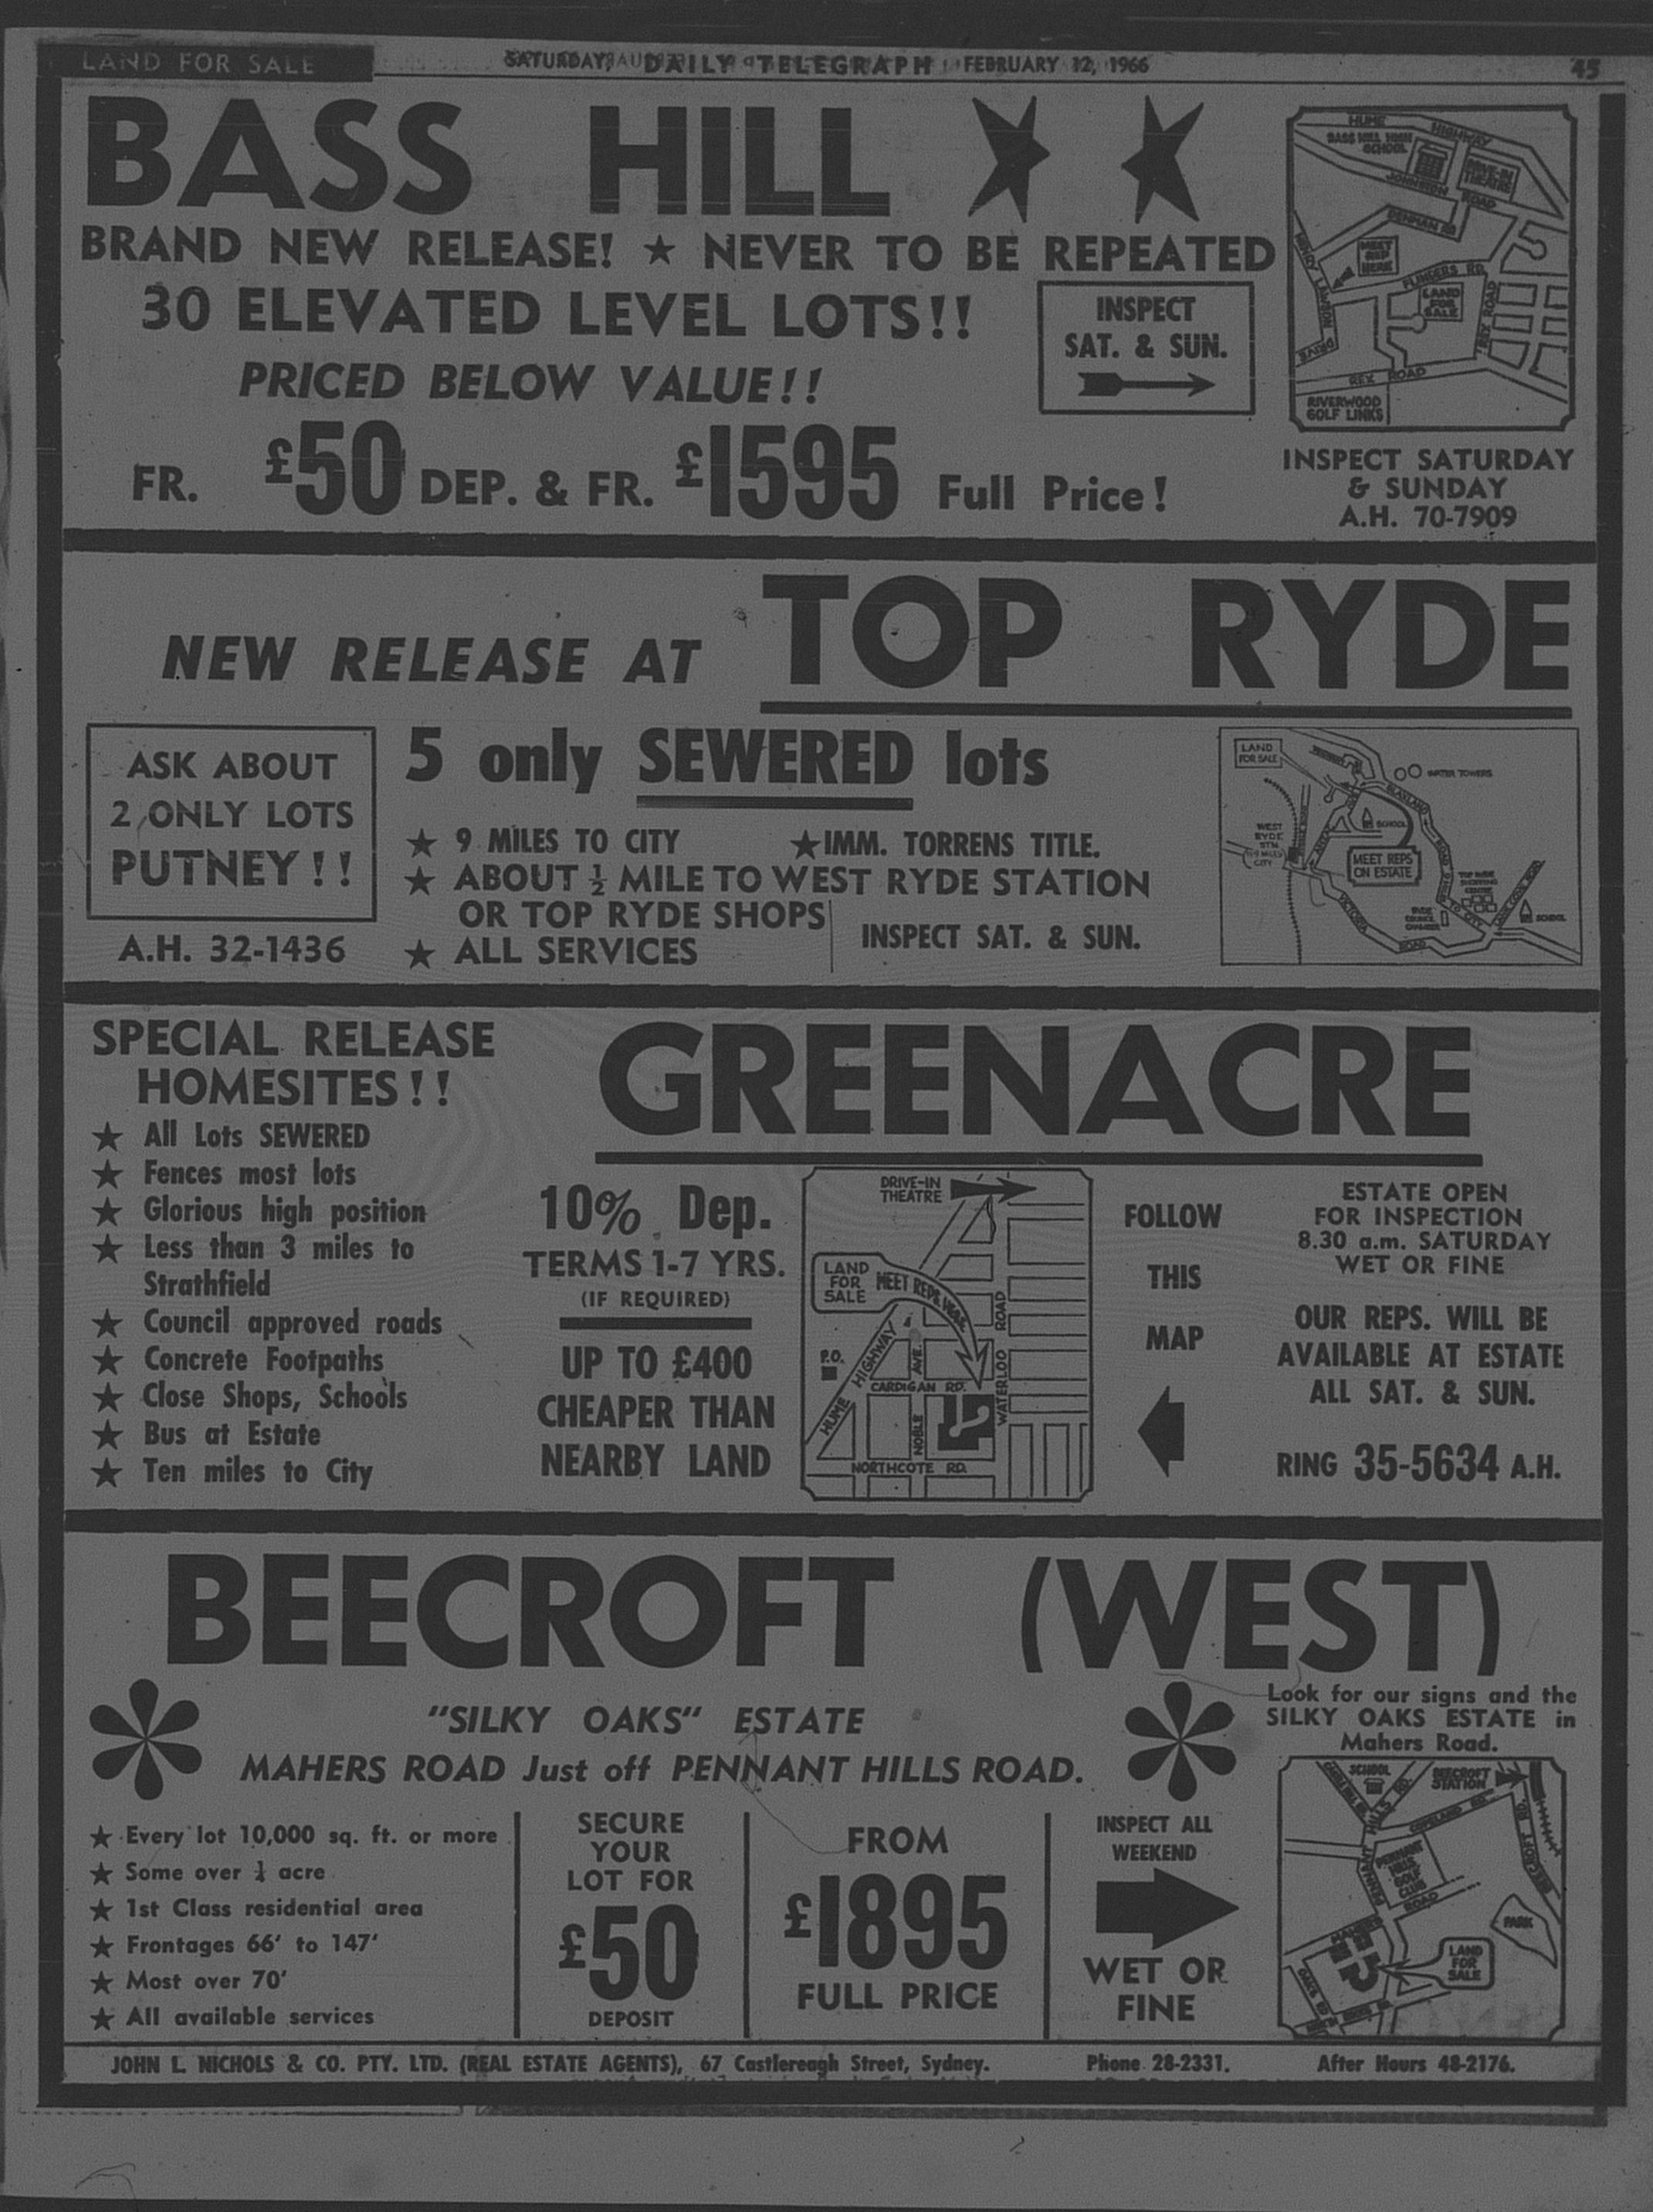 John L Nichols Ad February 12 1966 daily telegraph 45